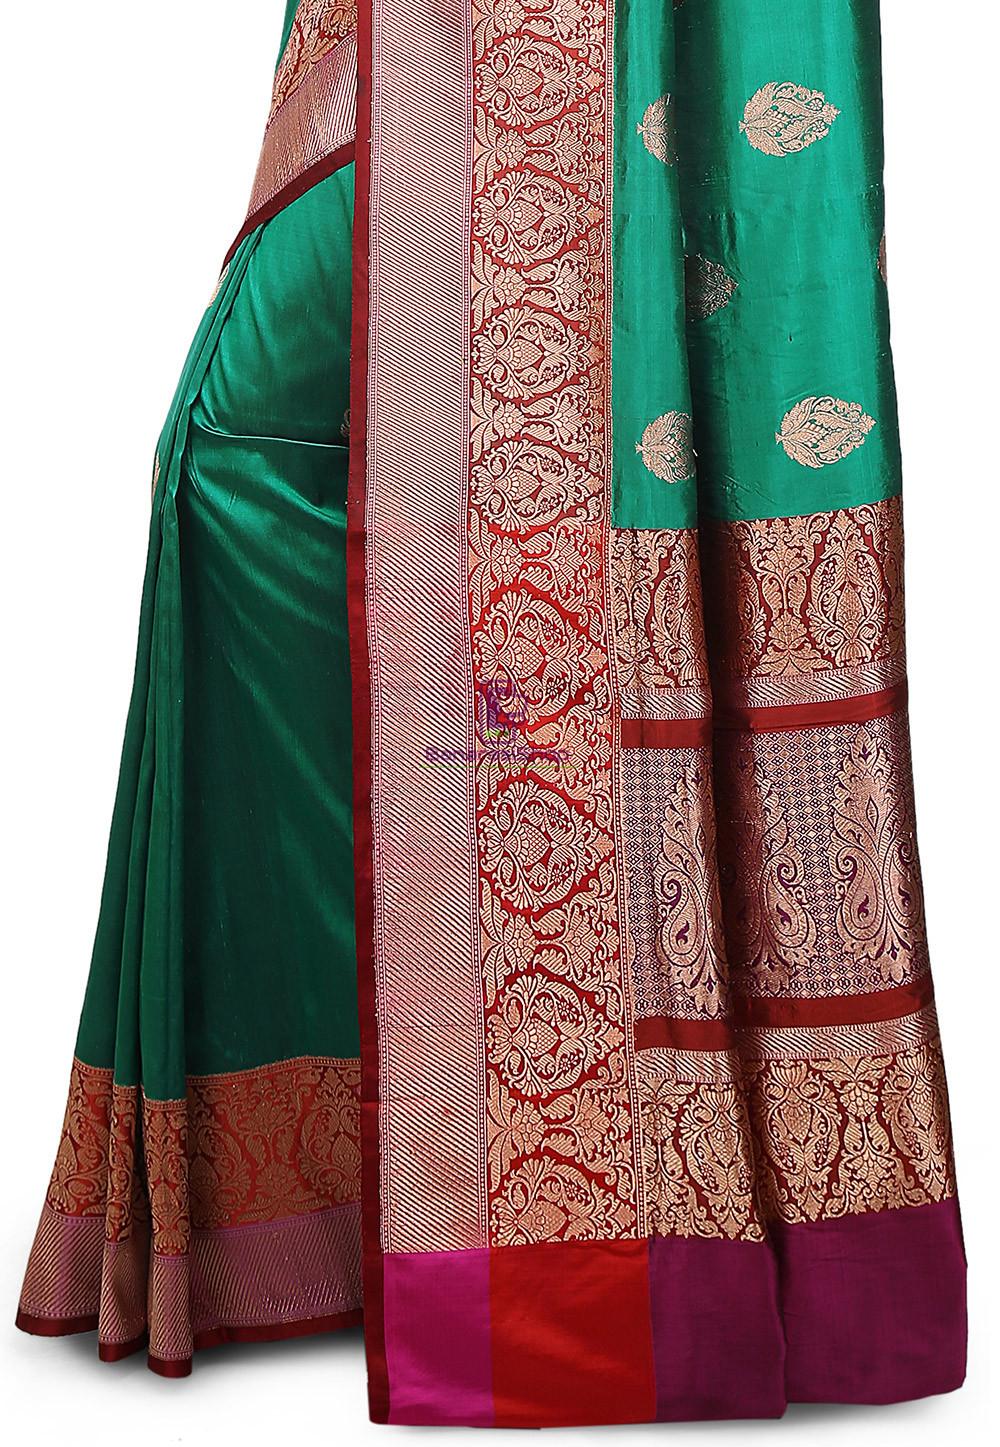 Banarasi Pure Katan Silk Handloom Saree in Teal Green 3